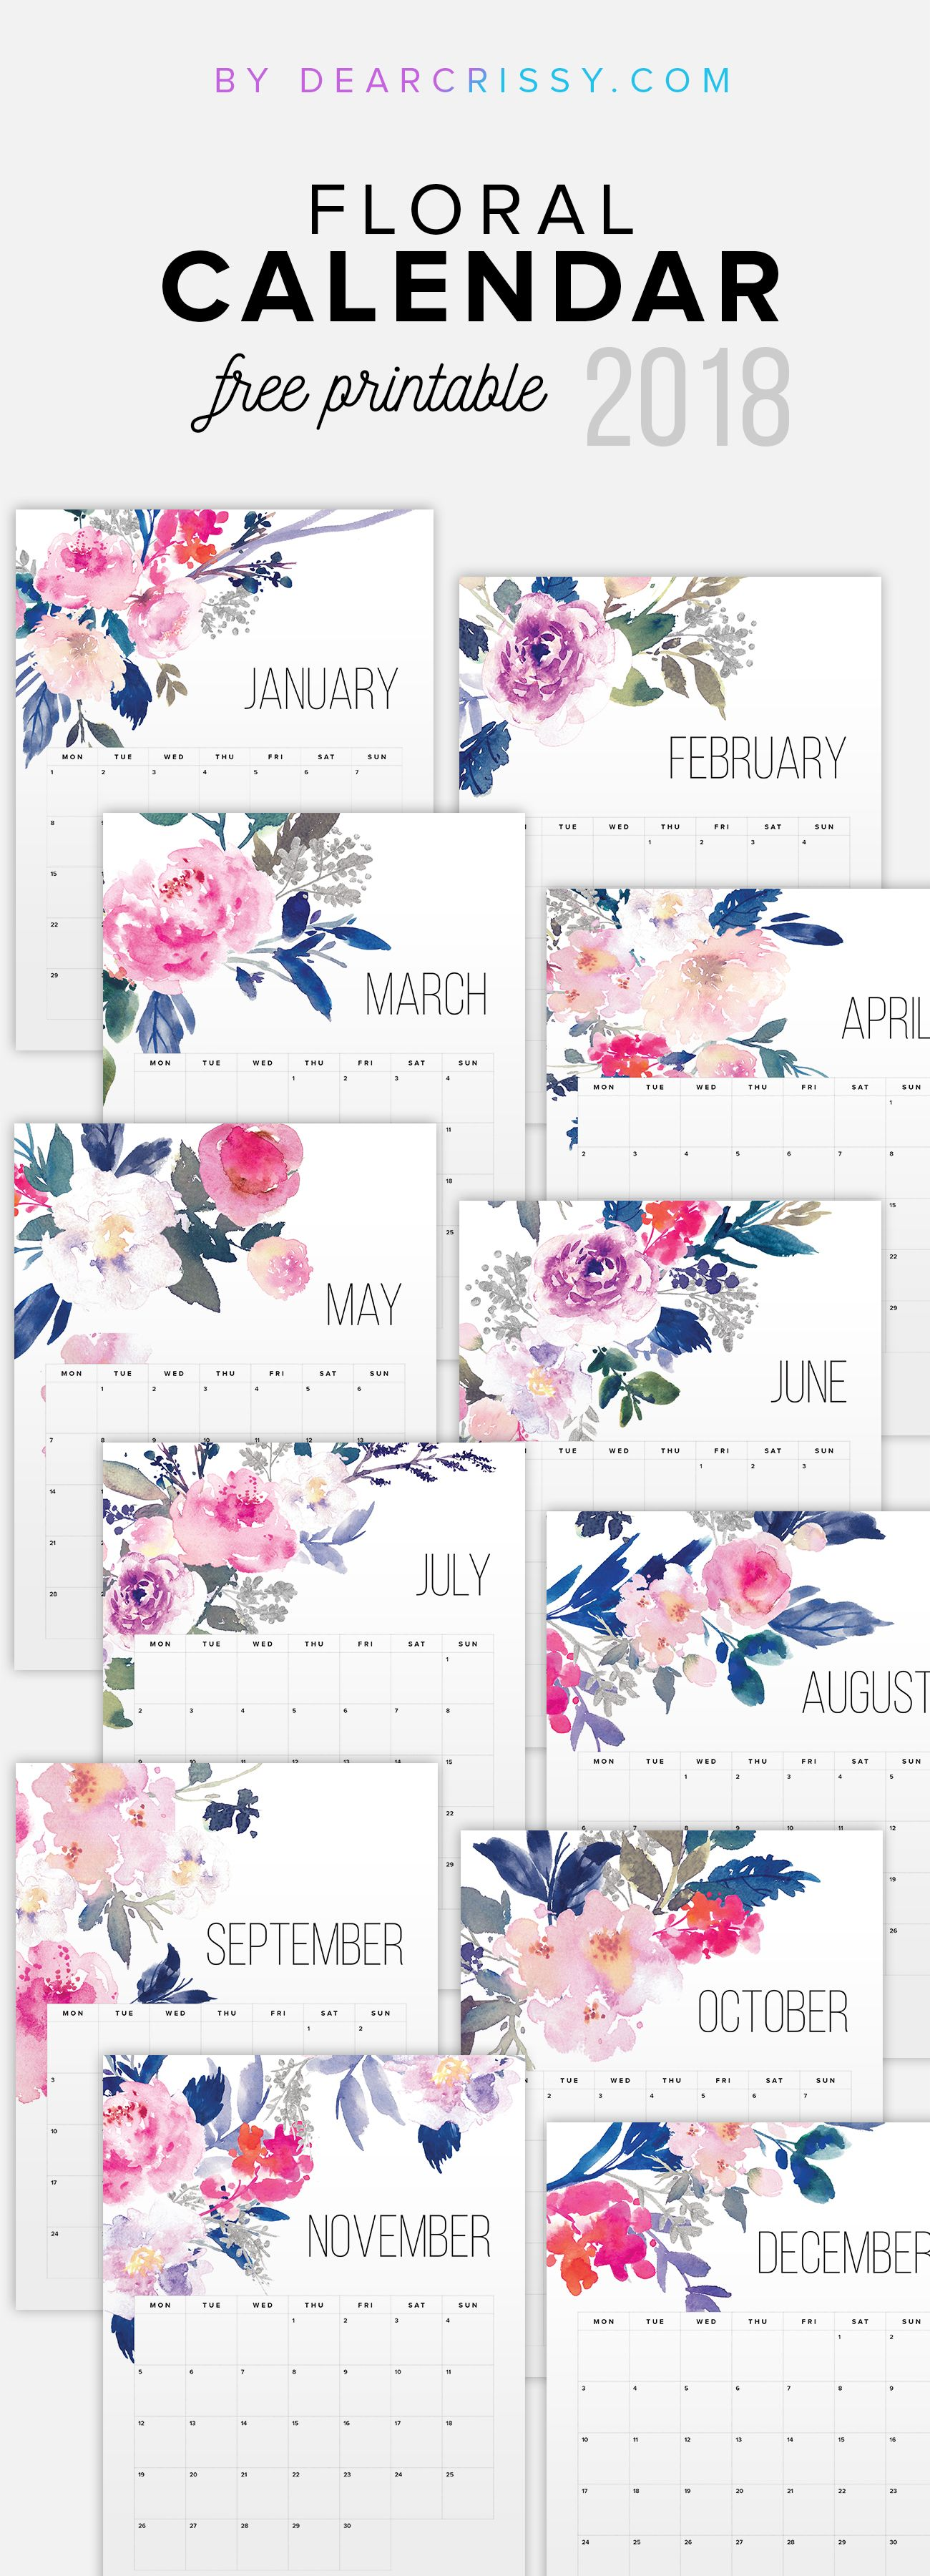 Year Calendar Pretty : Free printable floral calendar pretty desk